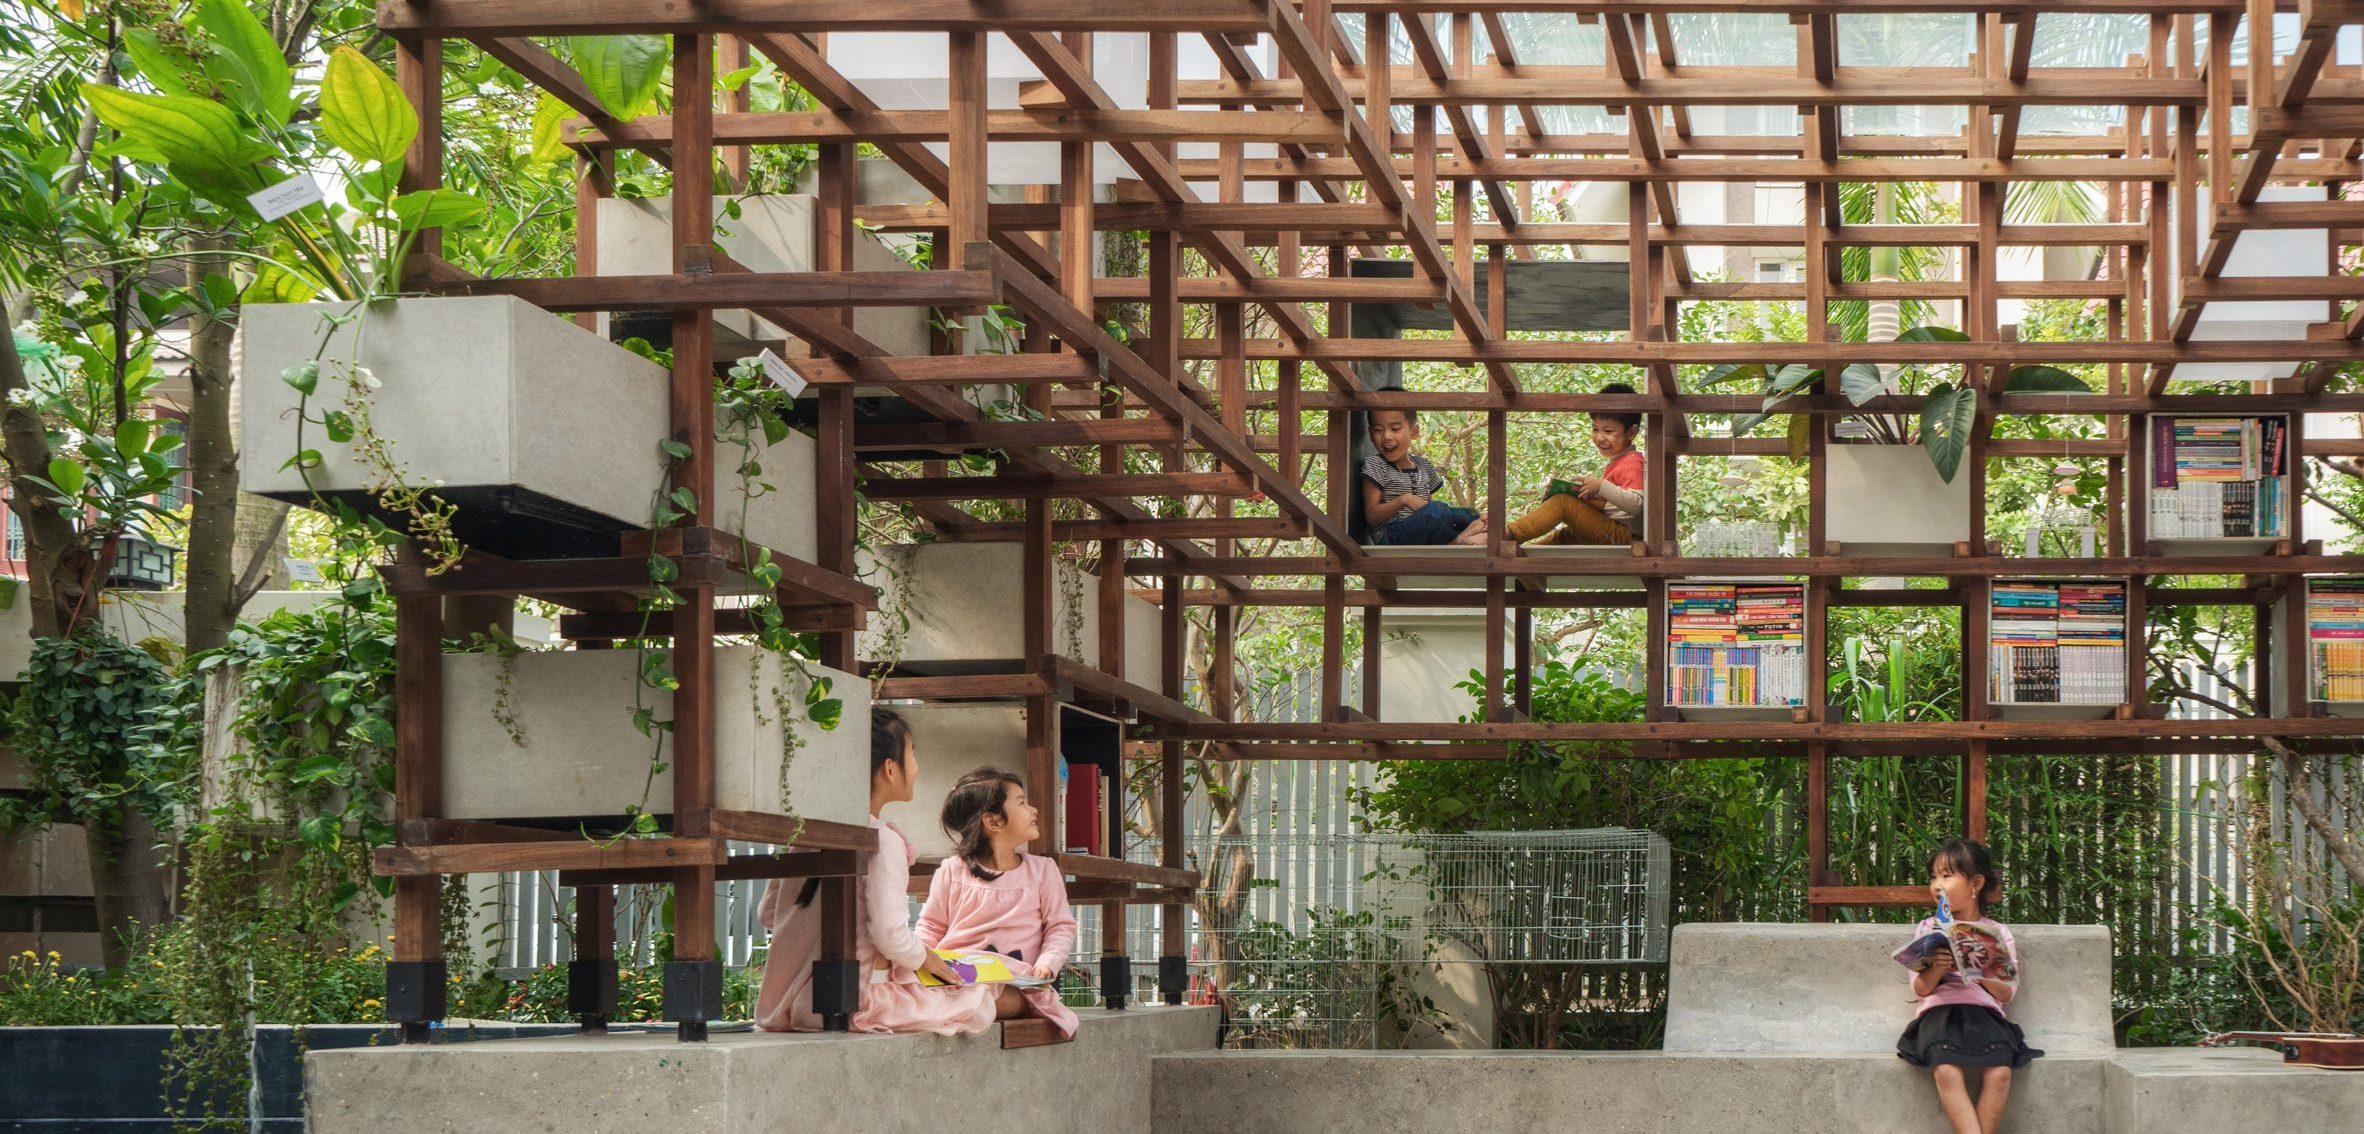 VAC-Library ห้องสมุดกลายเป็นห้องสนุกด้วยเกษตรแบบผสมผสานในกรุงฮานอย